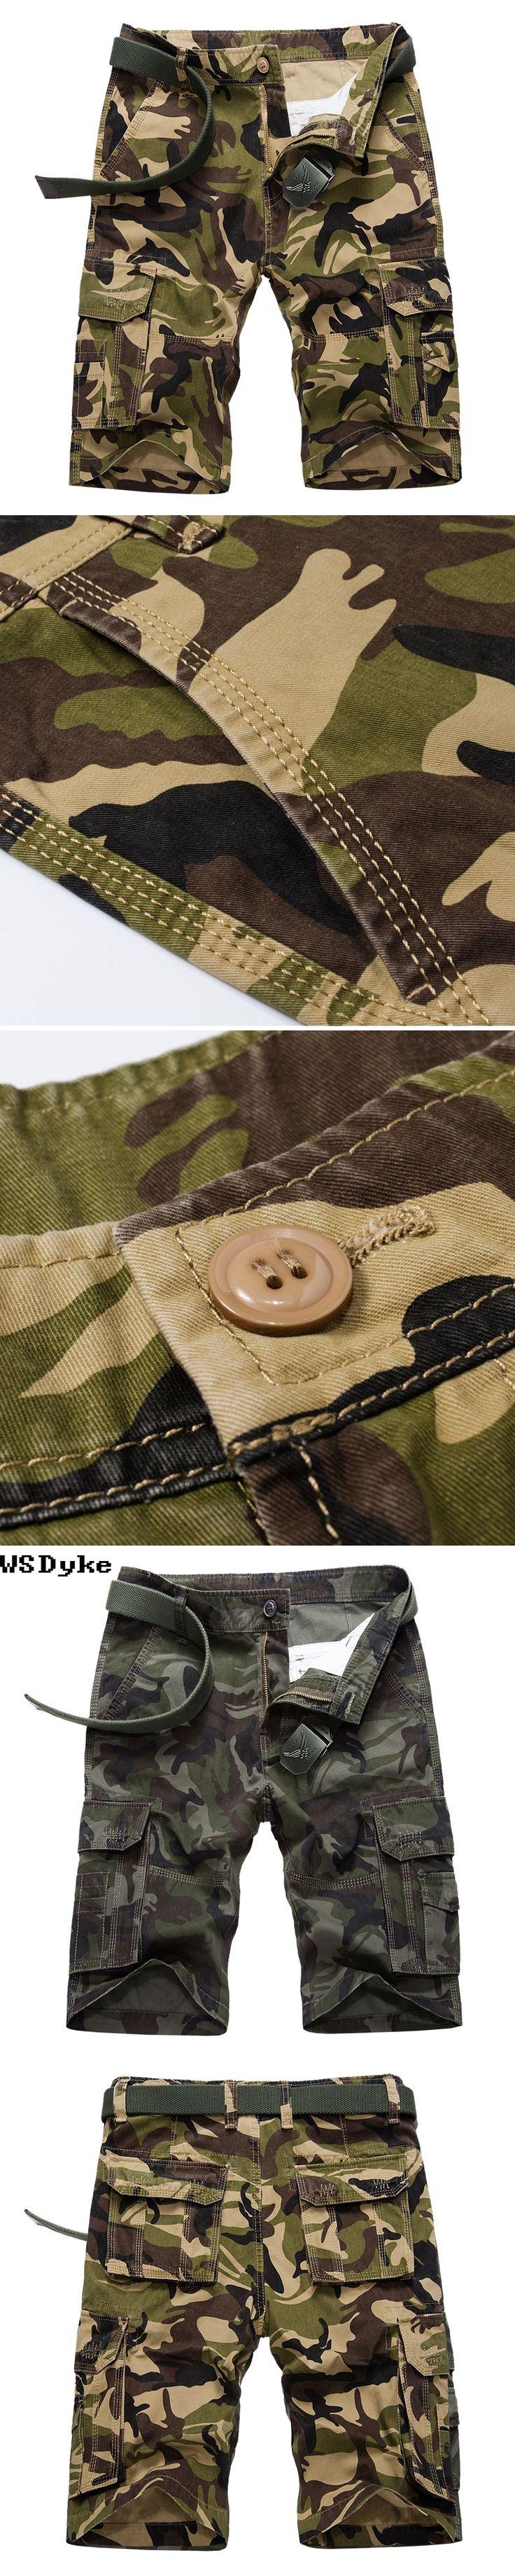 2017 Summer New Fashion Loose Pantalones Cortos De Los Hombres Good Quality Multi Pockets Camouflage Shorts